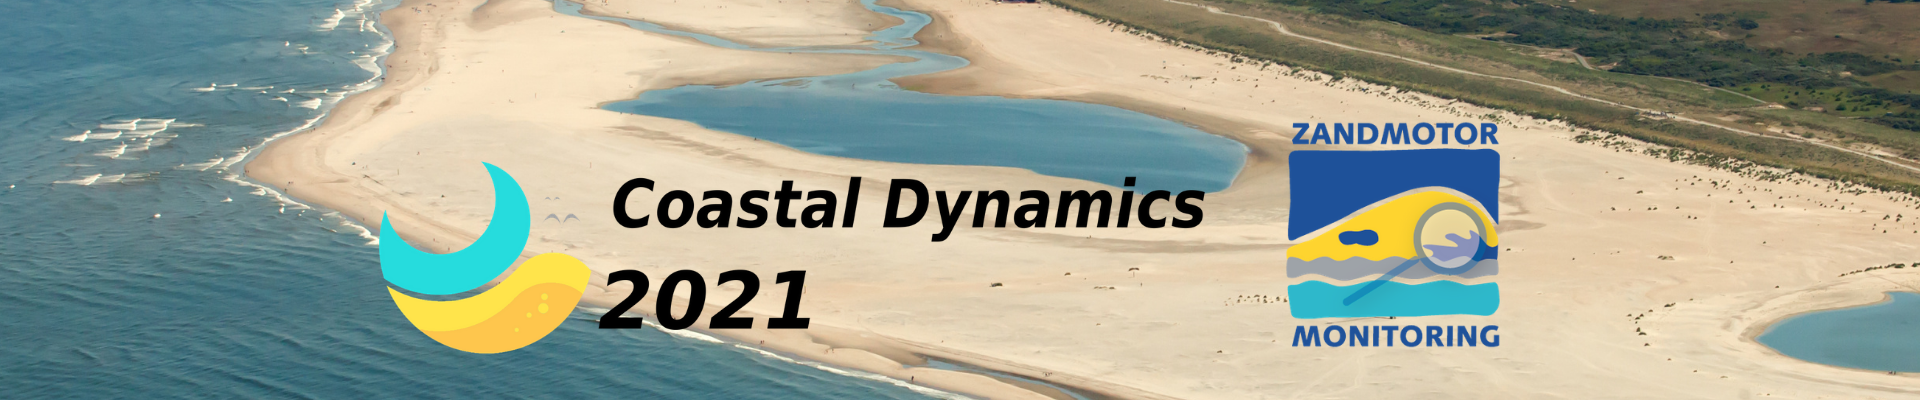 Coastal Dynamics 2021